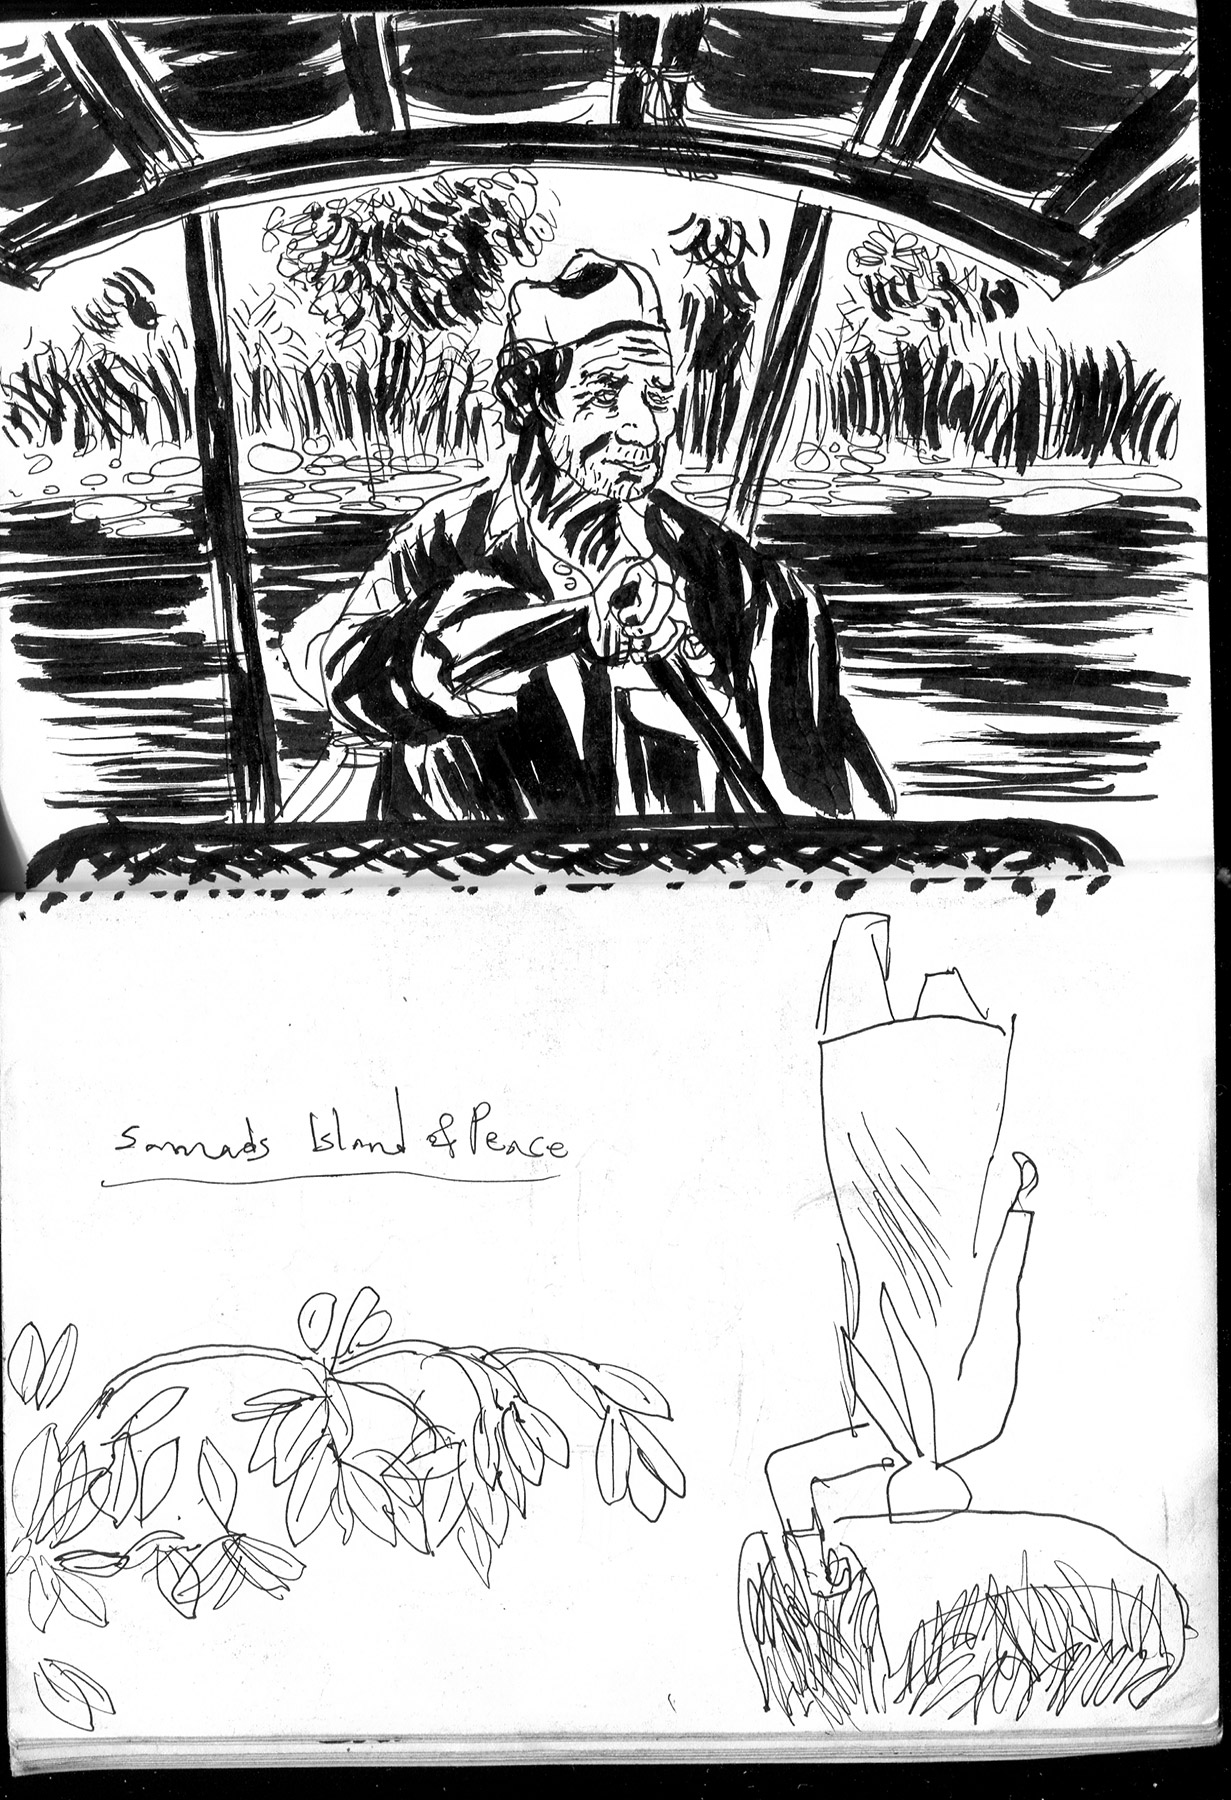 davidm_sketches_2014_08-014.jpg